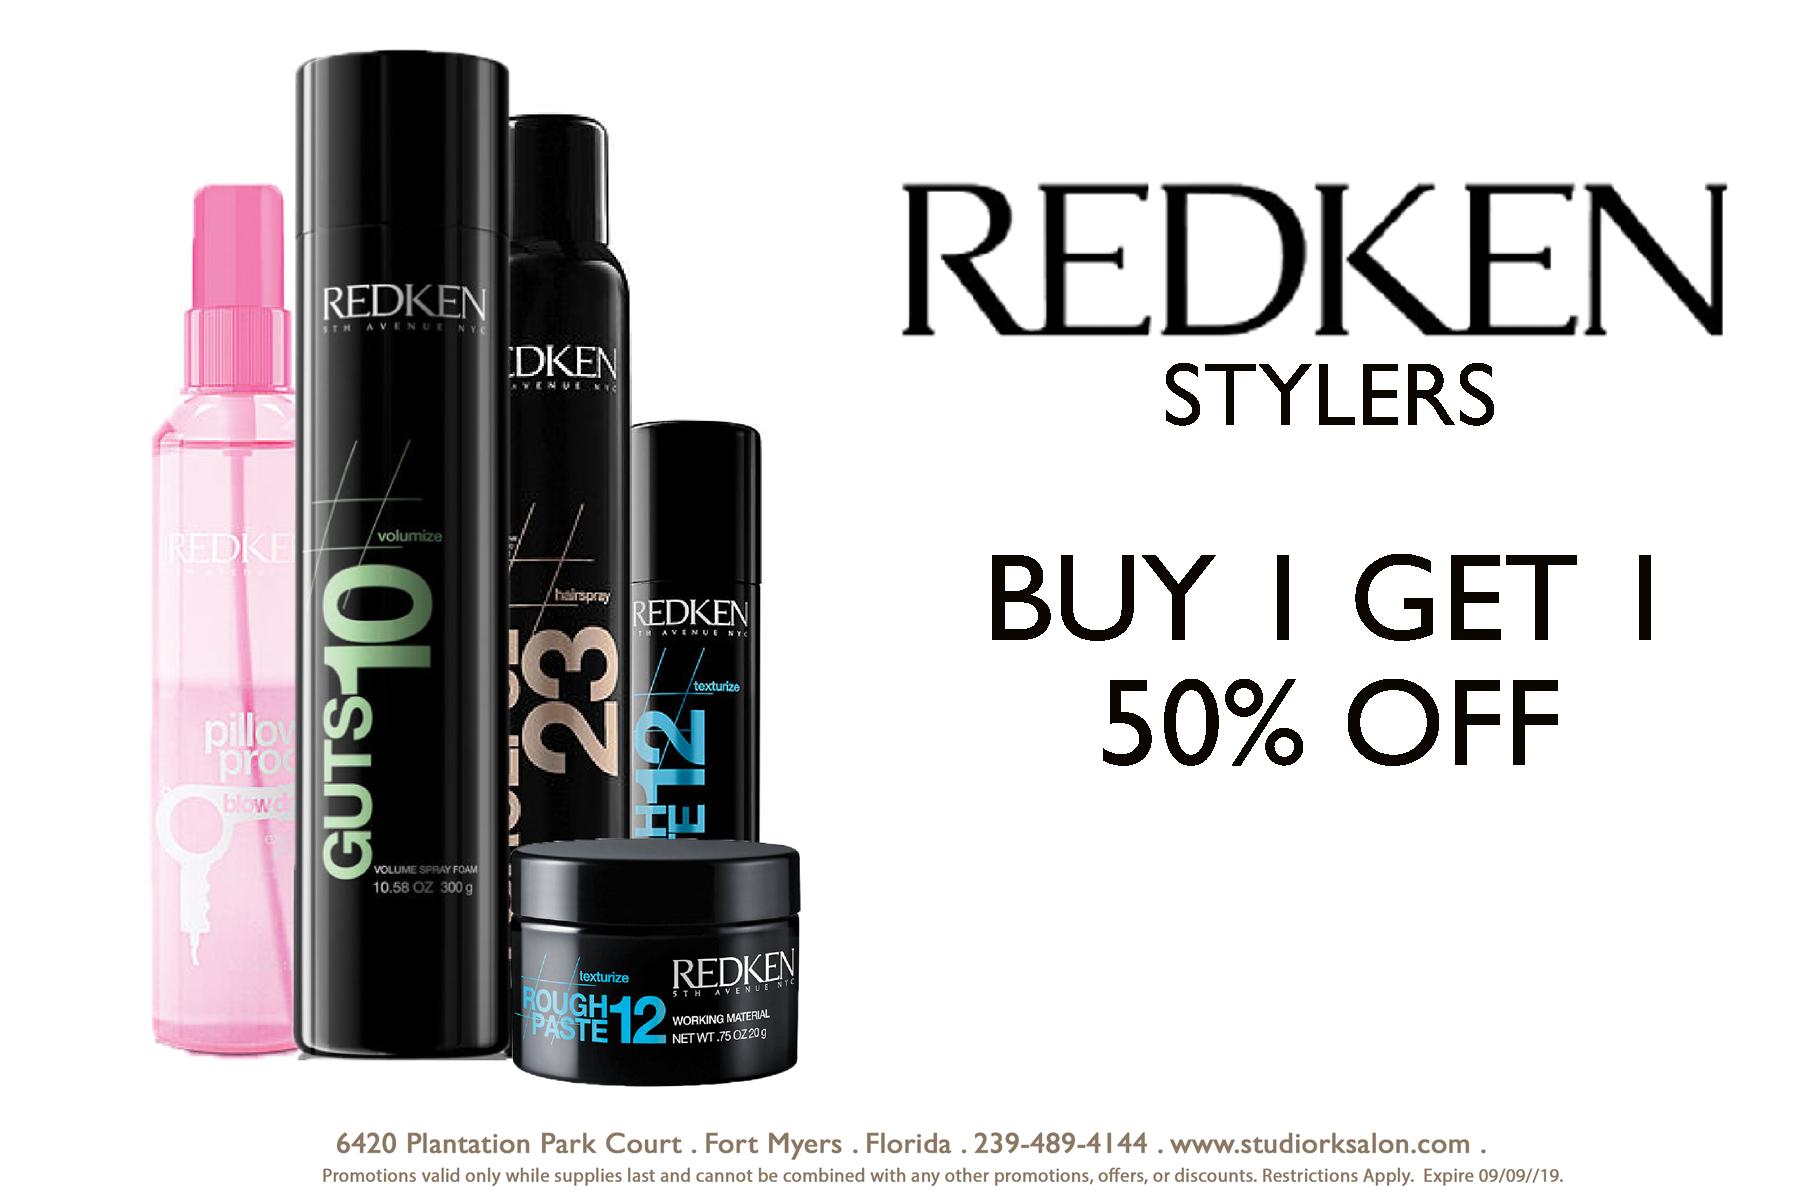 RedKen Buy One Get One 50% Off Promotion